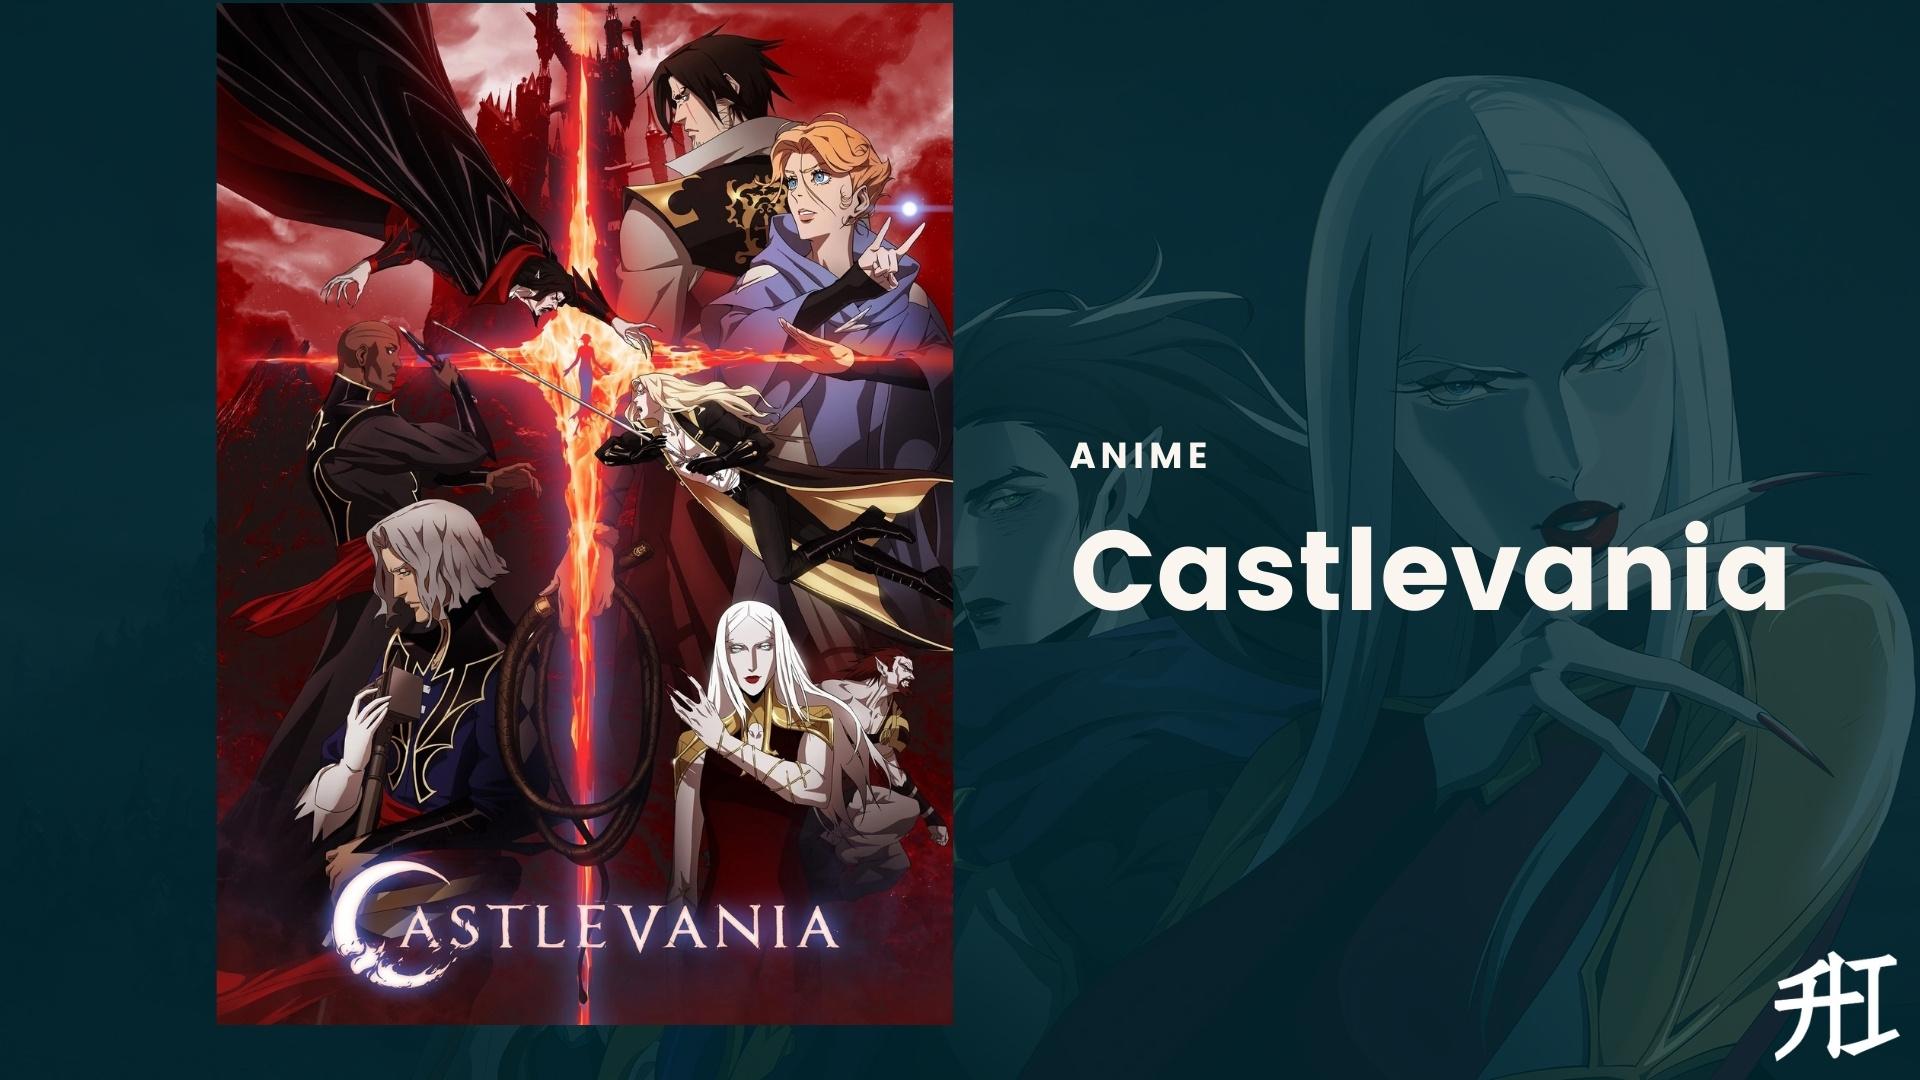 Castlevania is best anime like attack on titan on netflix